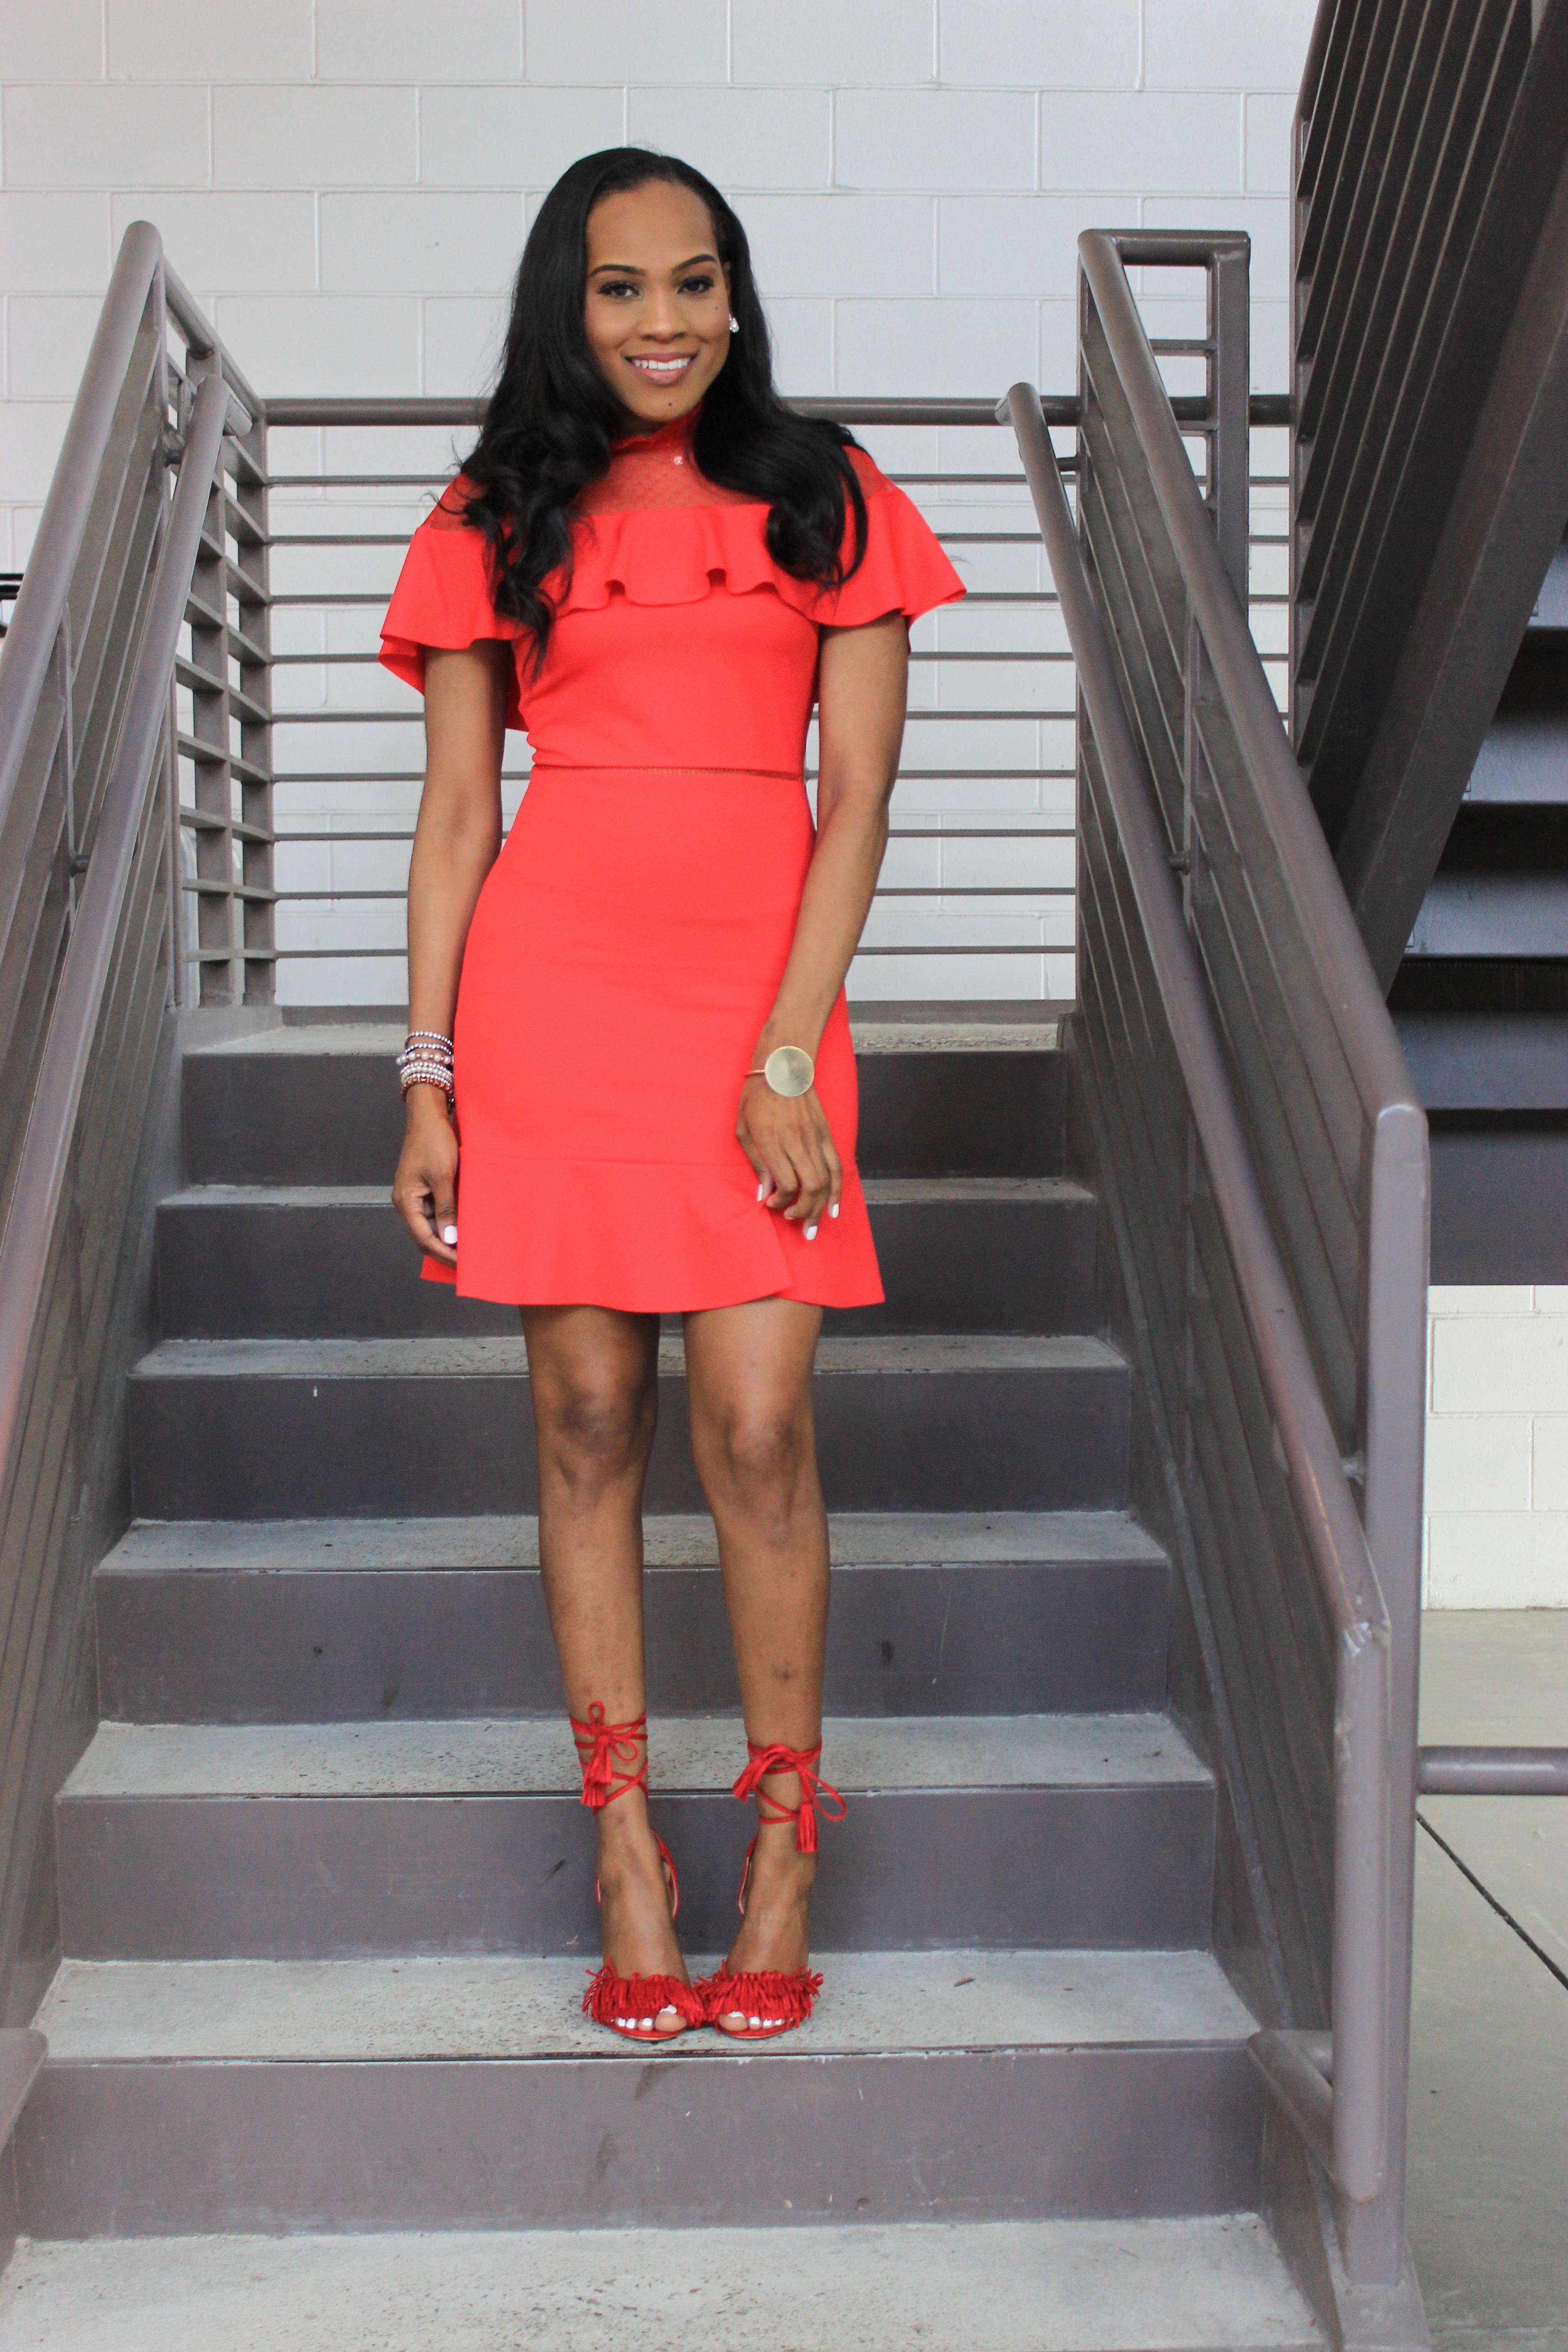 Style-files-Asos-Skater-Dress-with-Dobby-mesh-panel-red-skater-dress-asos-red-skater-dress-red-fringe-justfab-heels-justfab-red-tayrey-heel-sandals-oohlalablog-